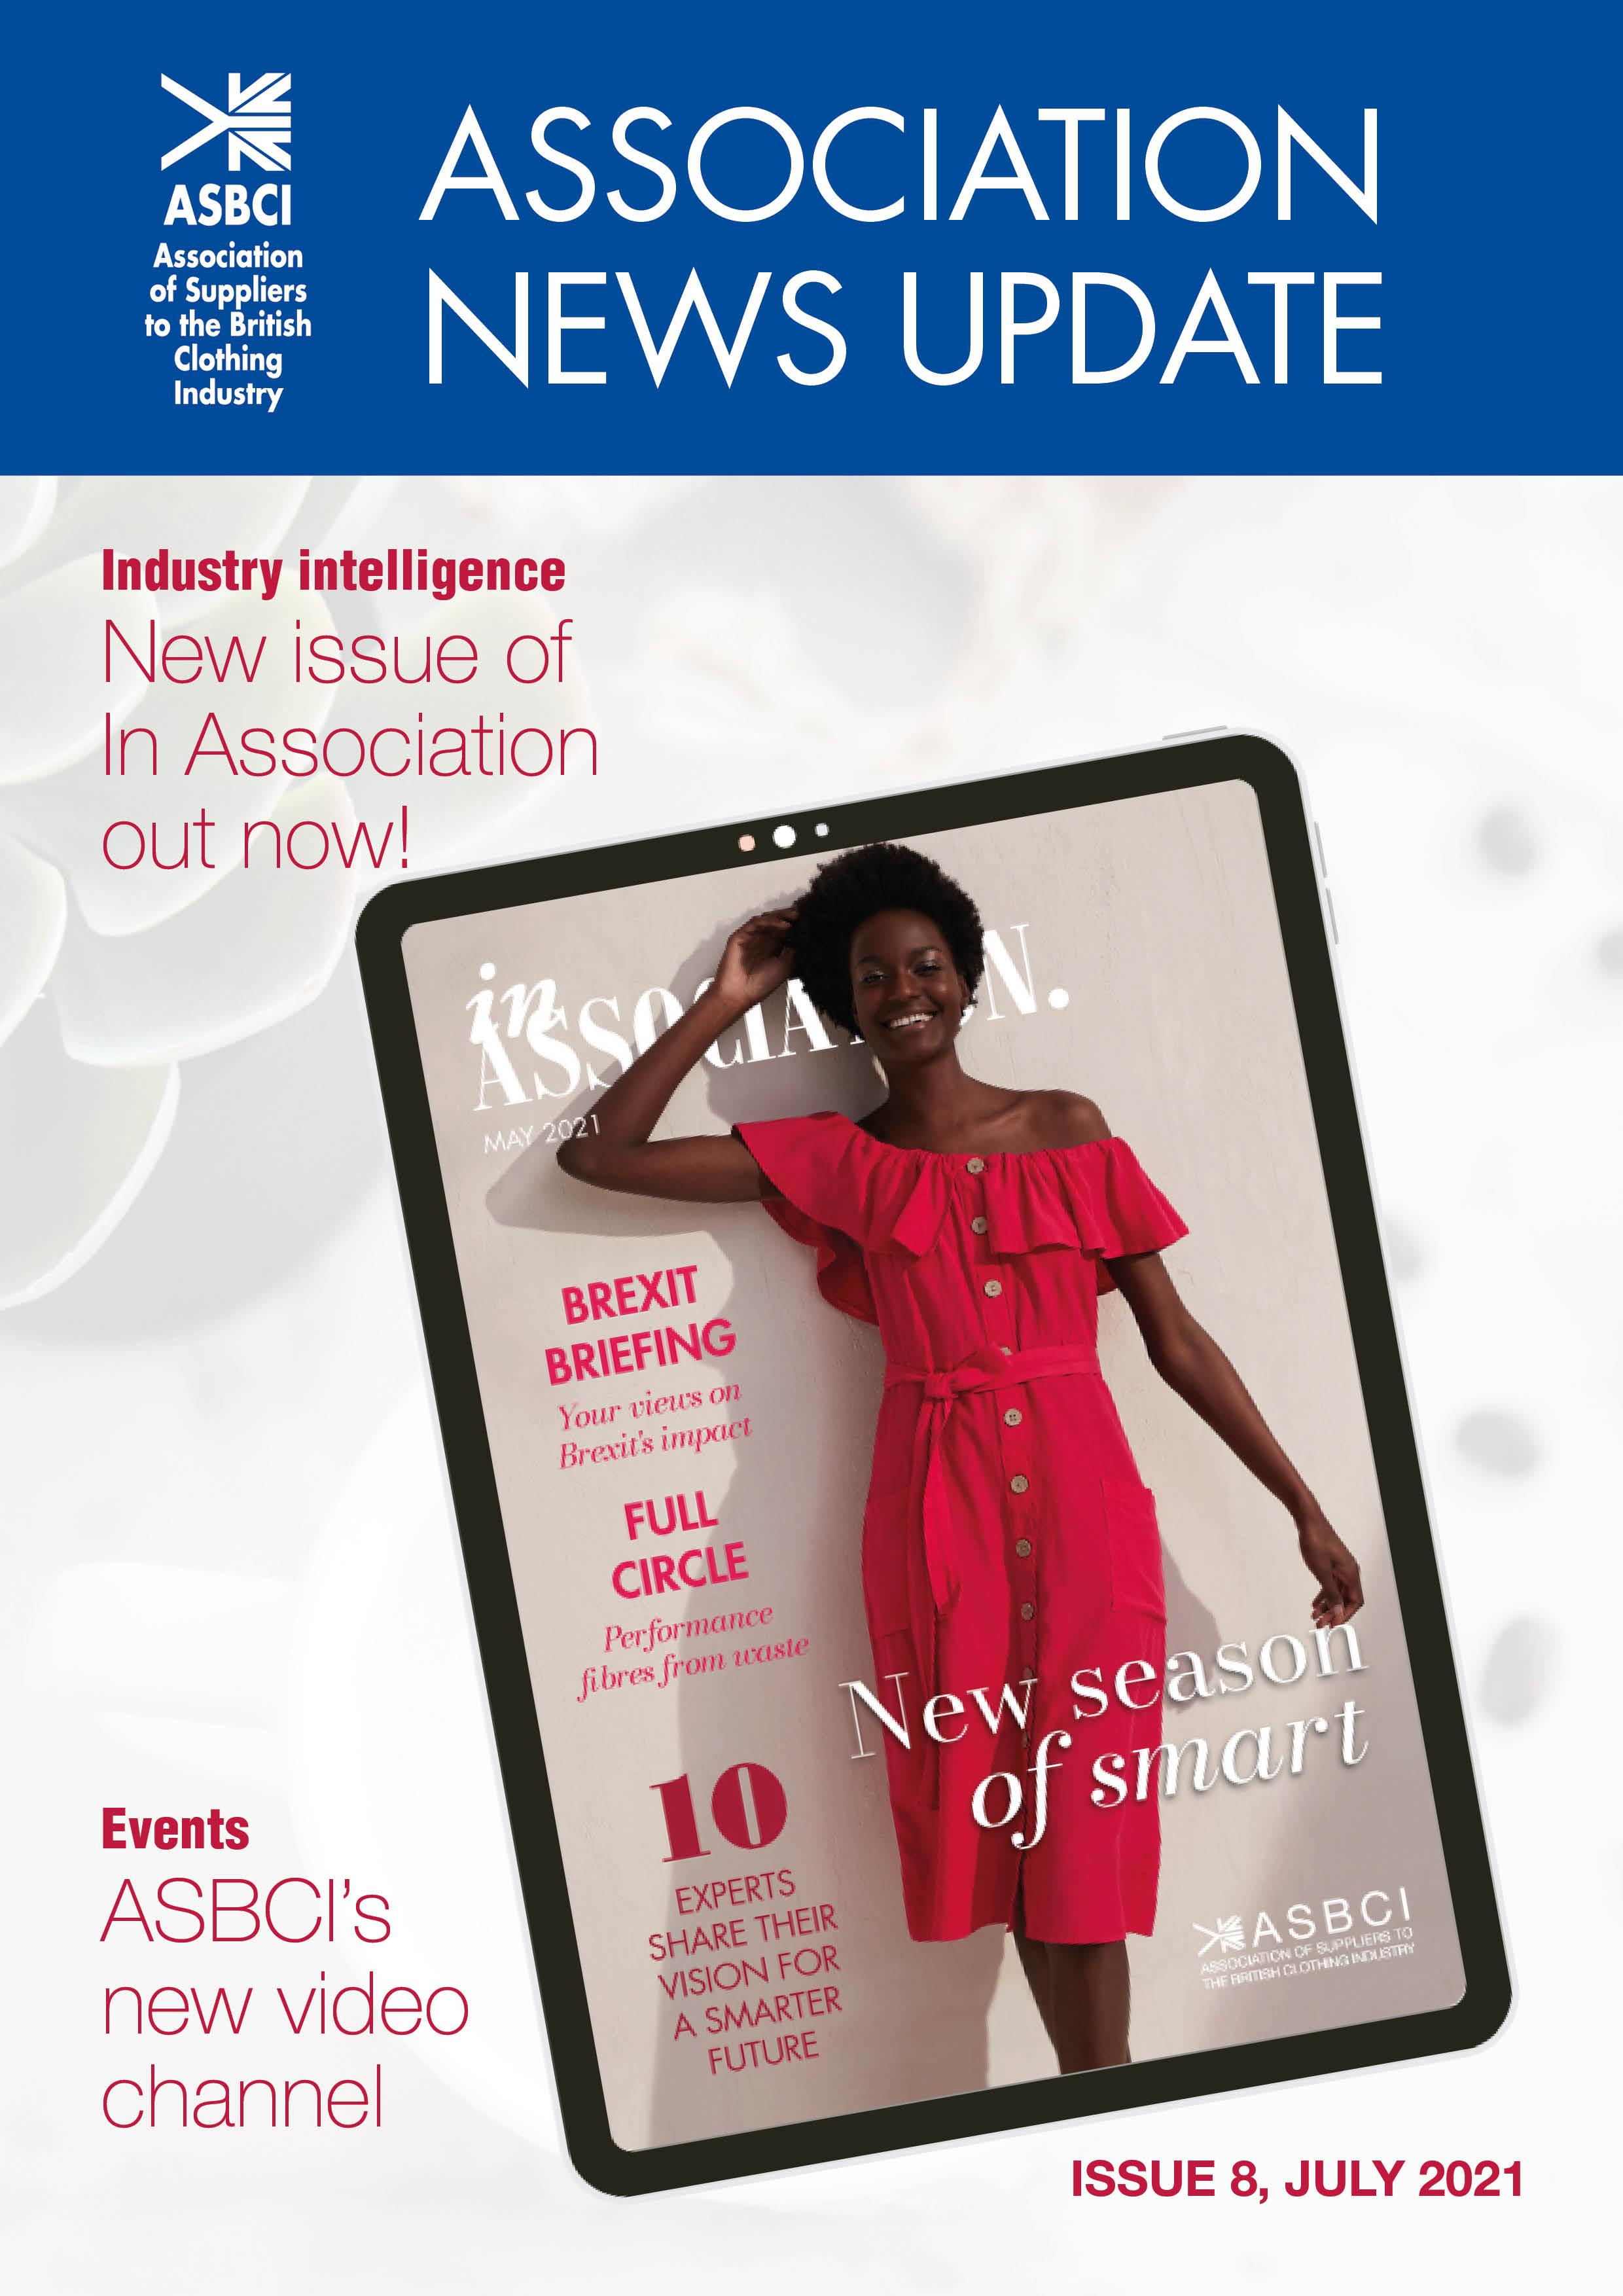 Issue 8 Association News Update